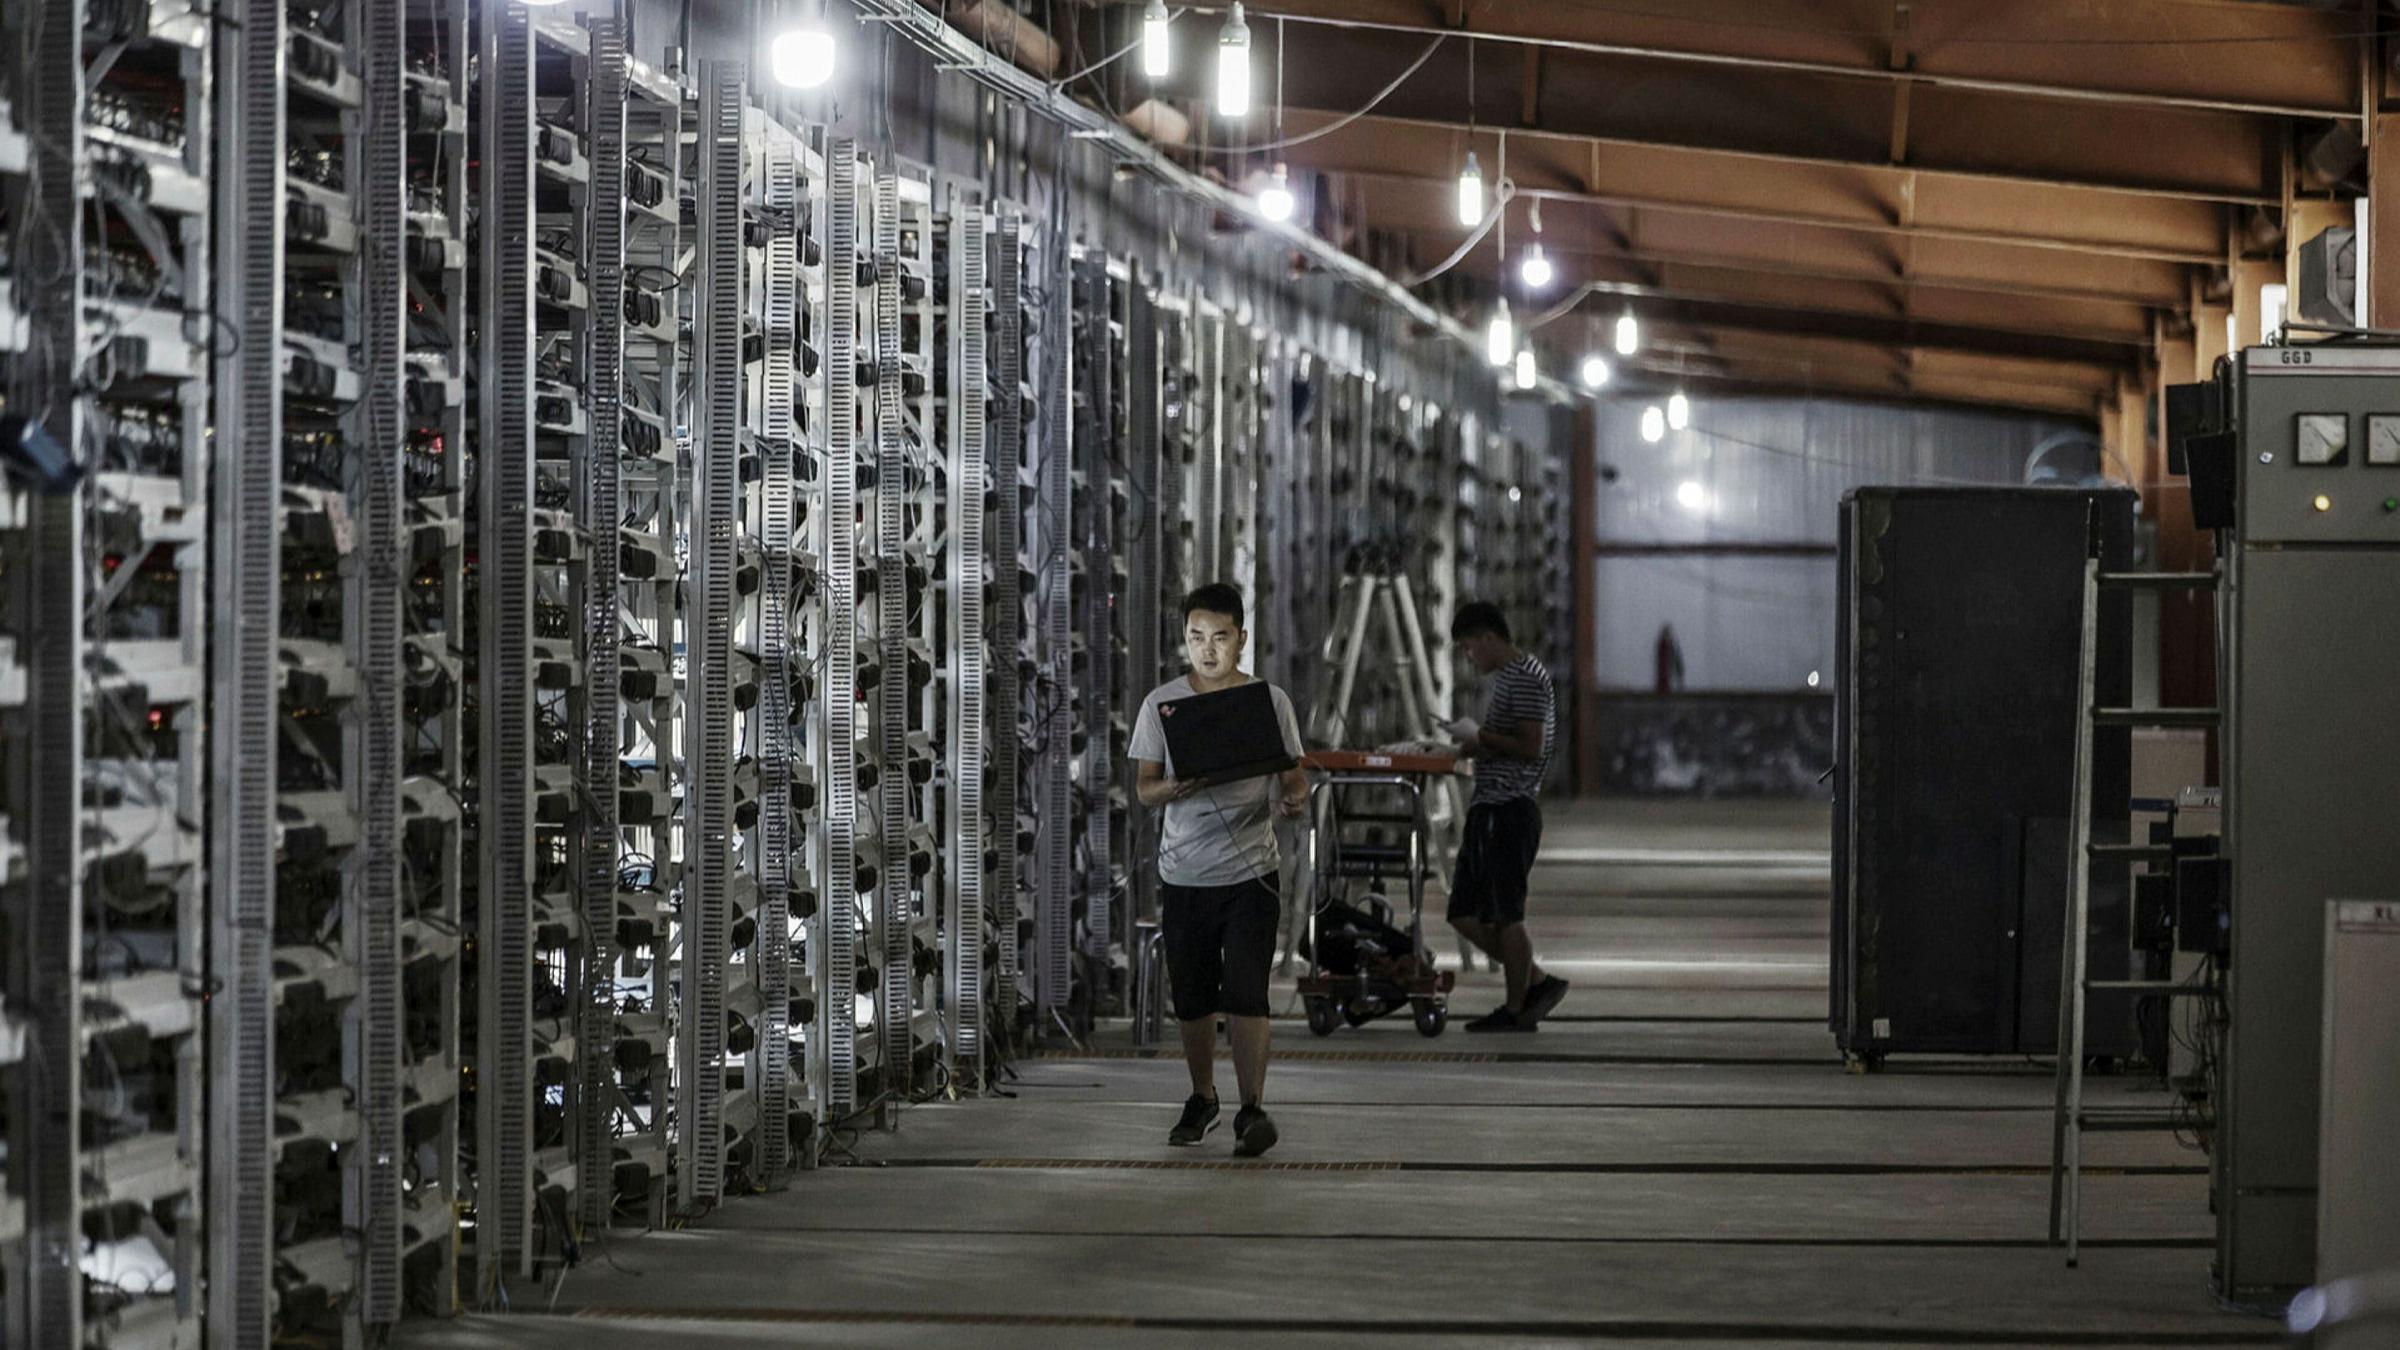 Chinesische Cryptocurcy Farm.